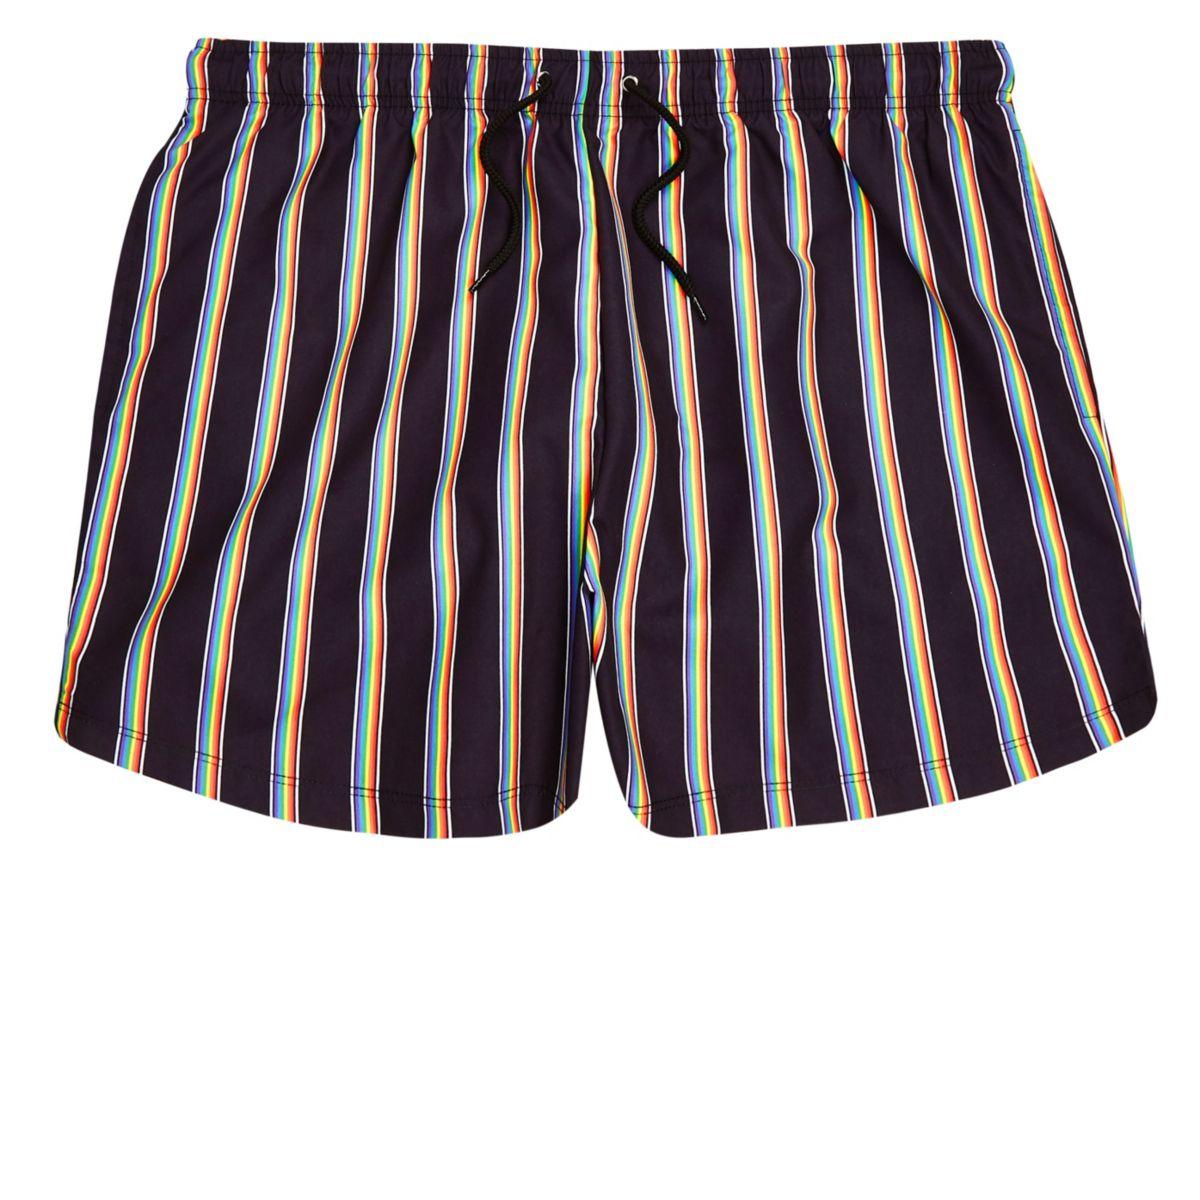 Black Pride rainbow print swim shorts